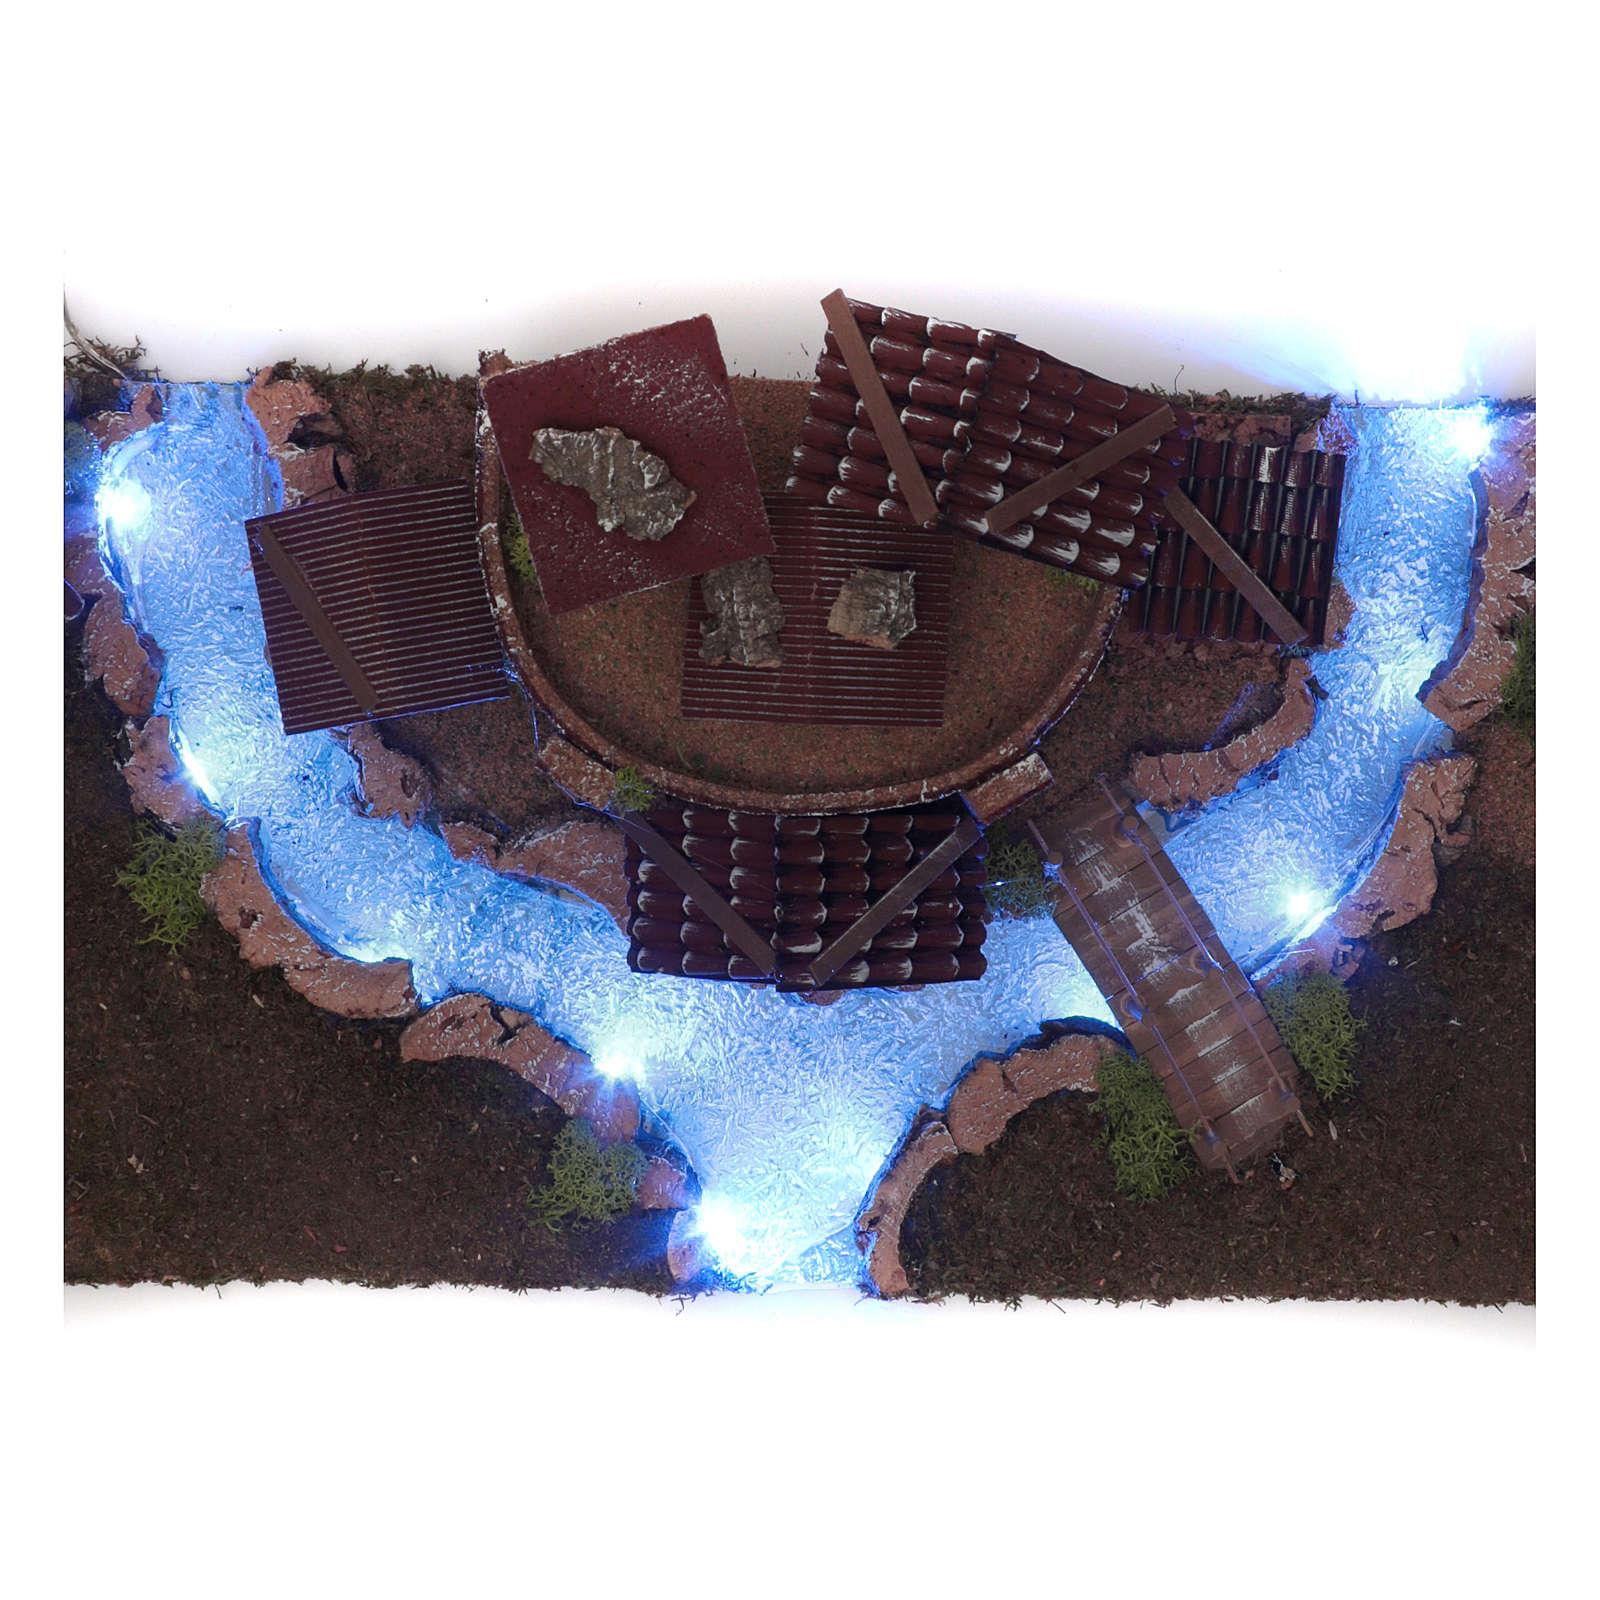 Aldea con río luminoso 18x55x24 cm 4